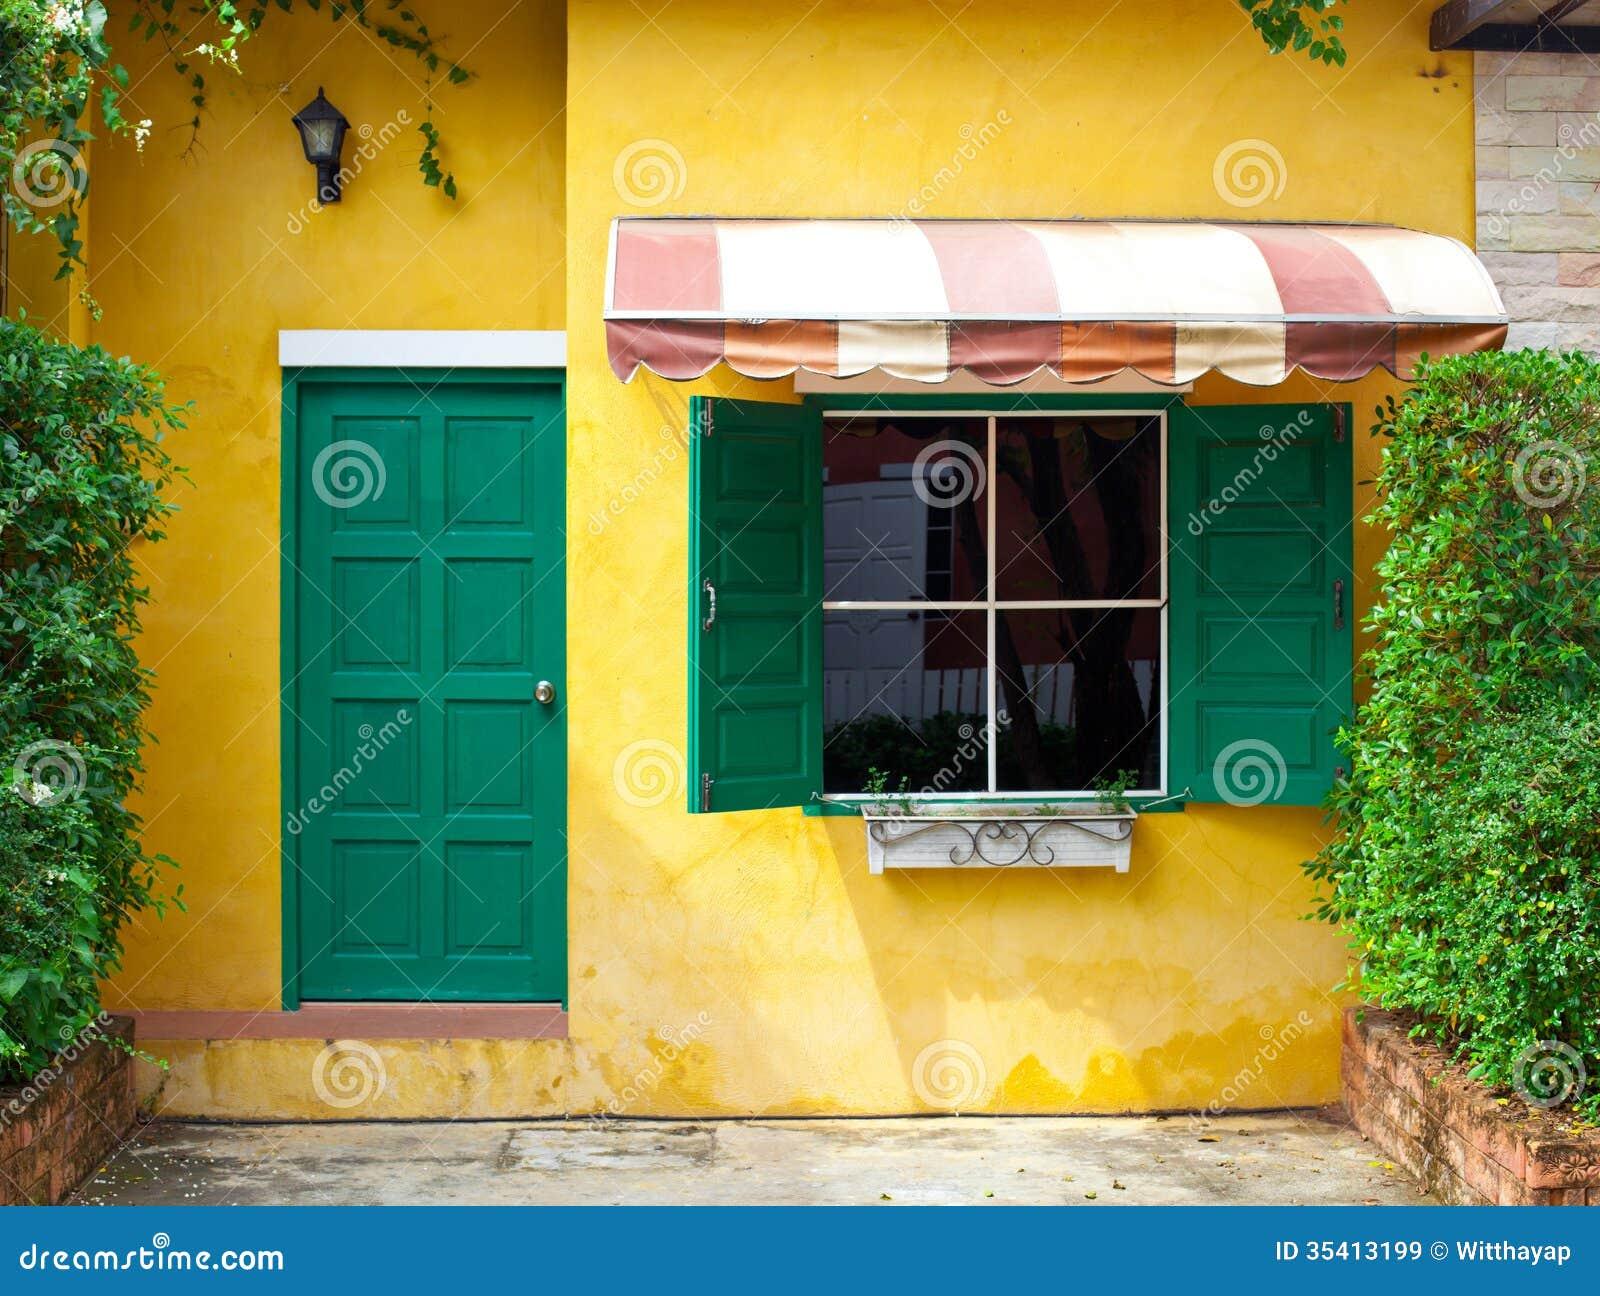 Europe Style House Royalty Free Stock Images Image 35413199